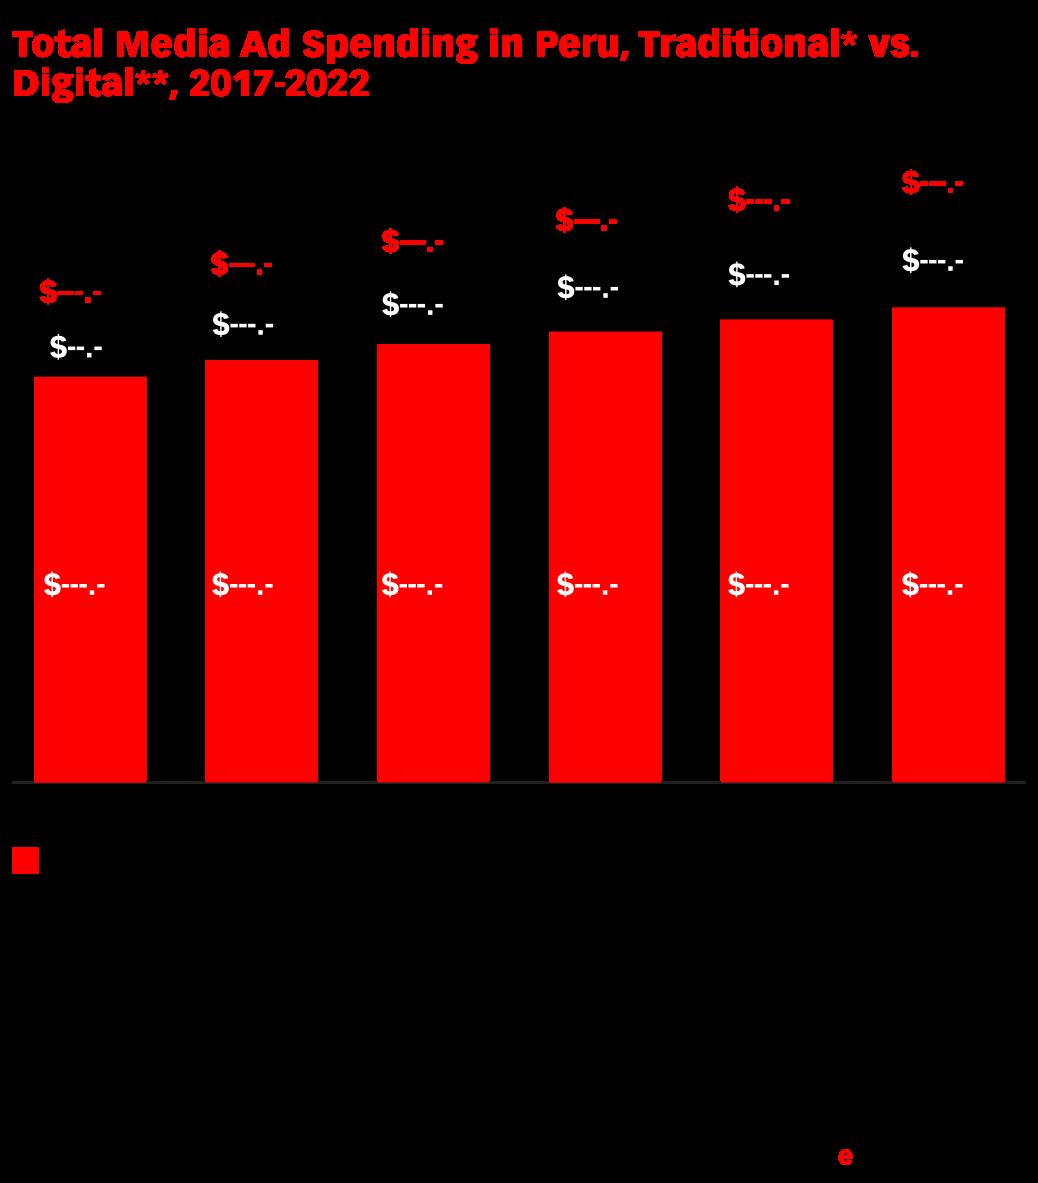 Total Media Ad Spending in Peru, Traditional* vs. Digital**, 2017-2022 (millions)